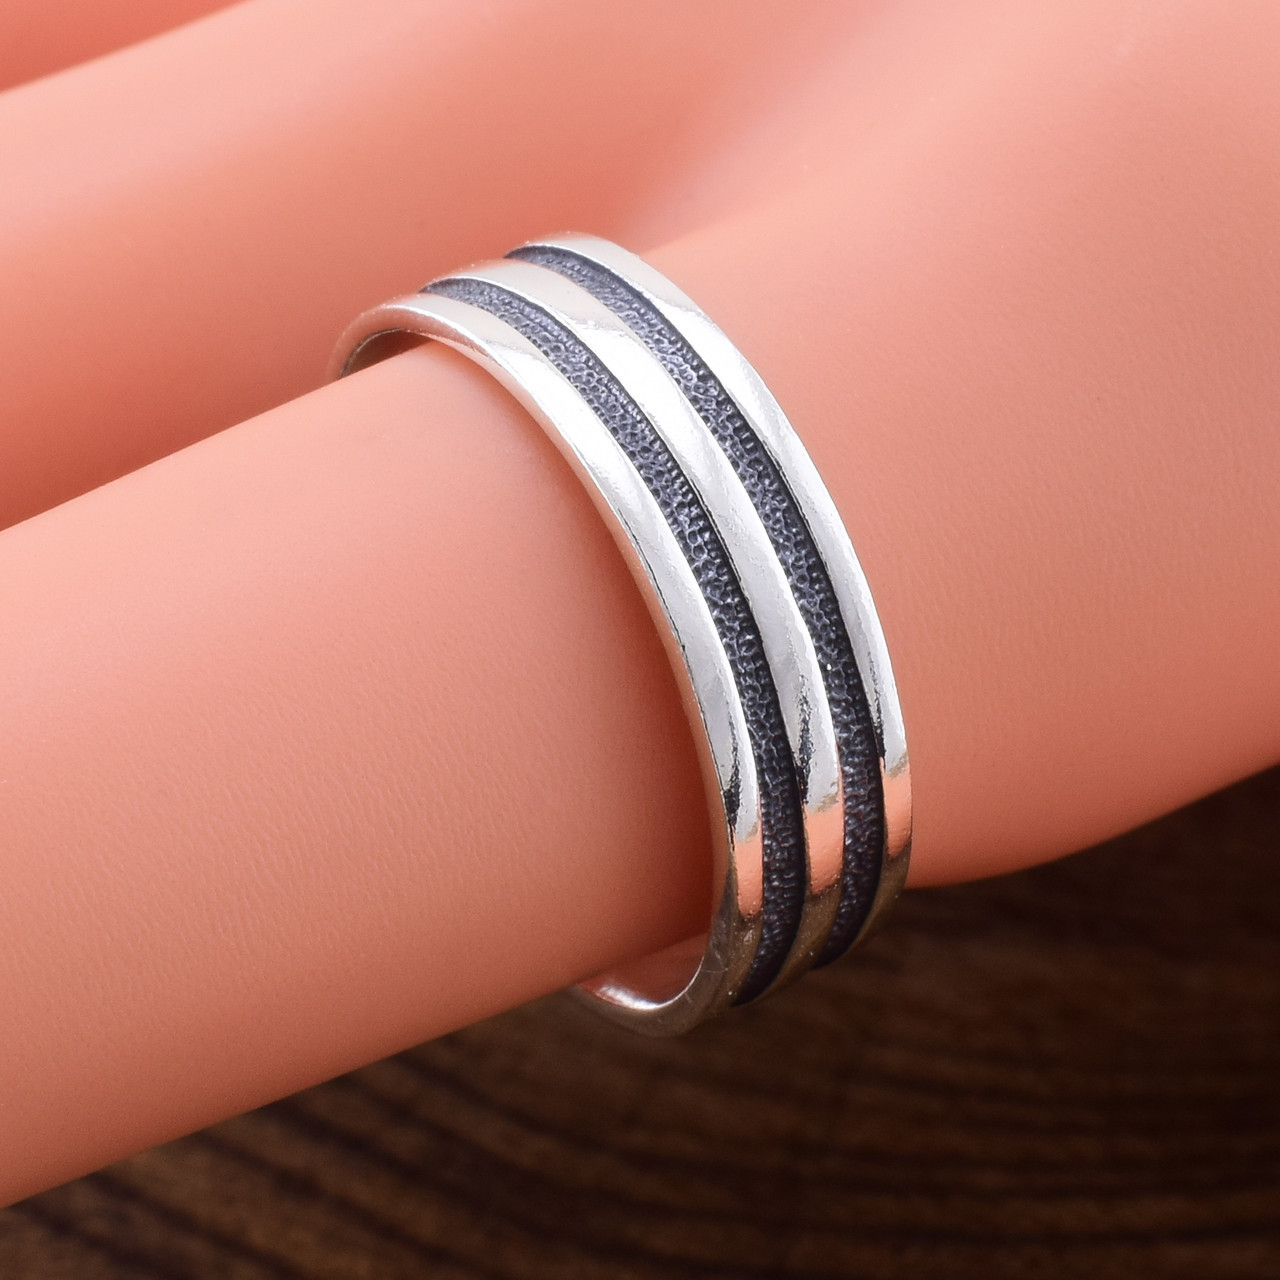 Серебряное кольцо Принцип вес 3.1 г размер 18.5